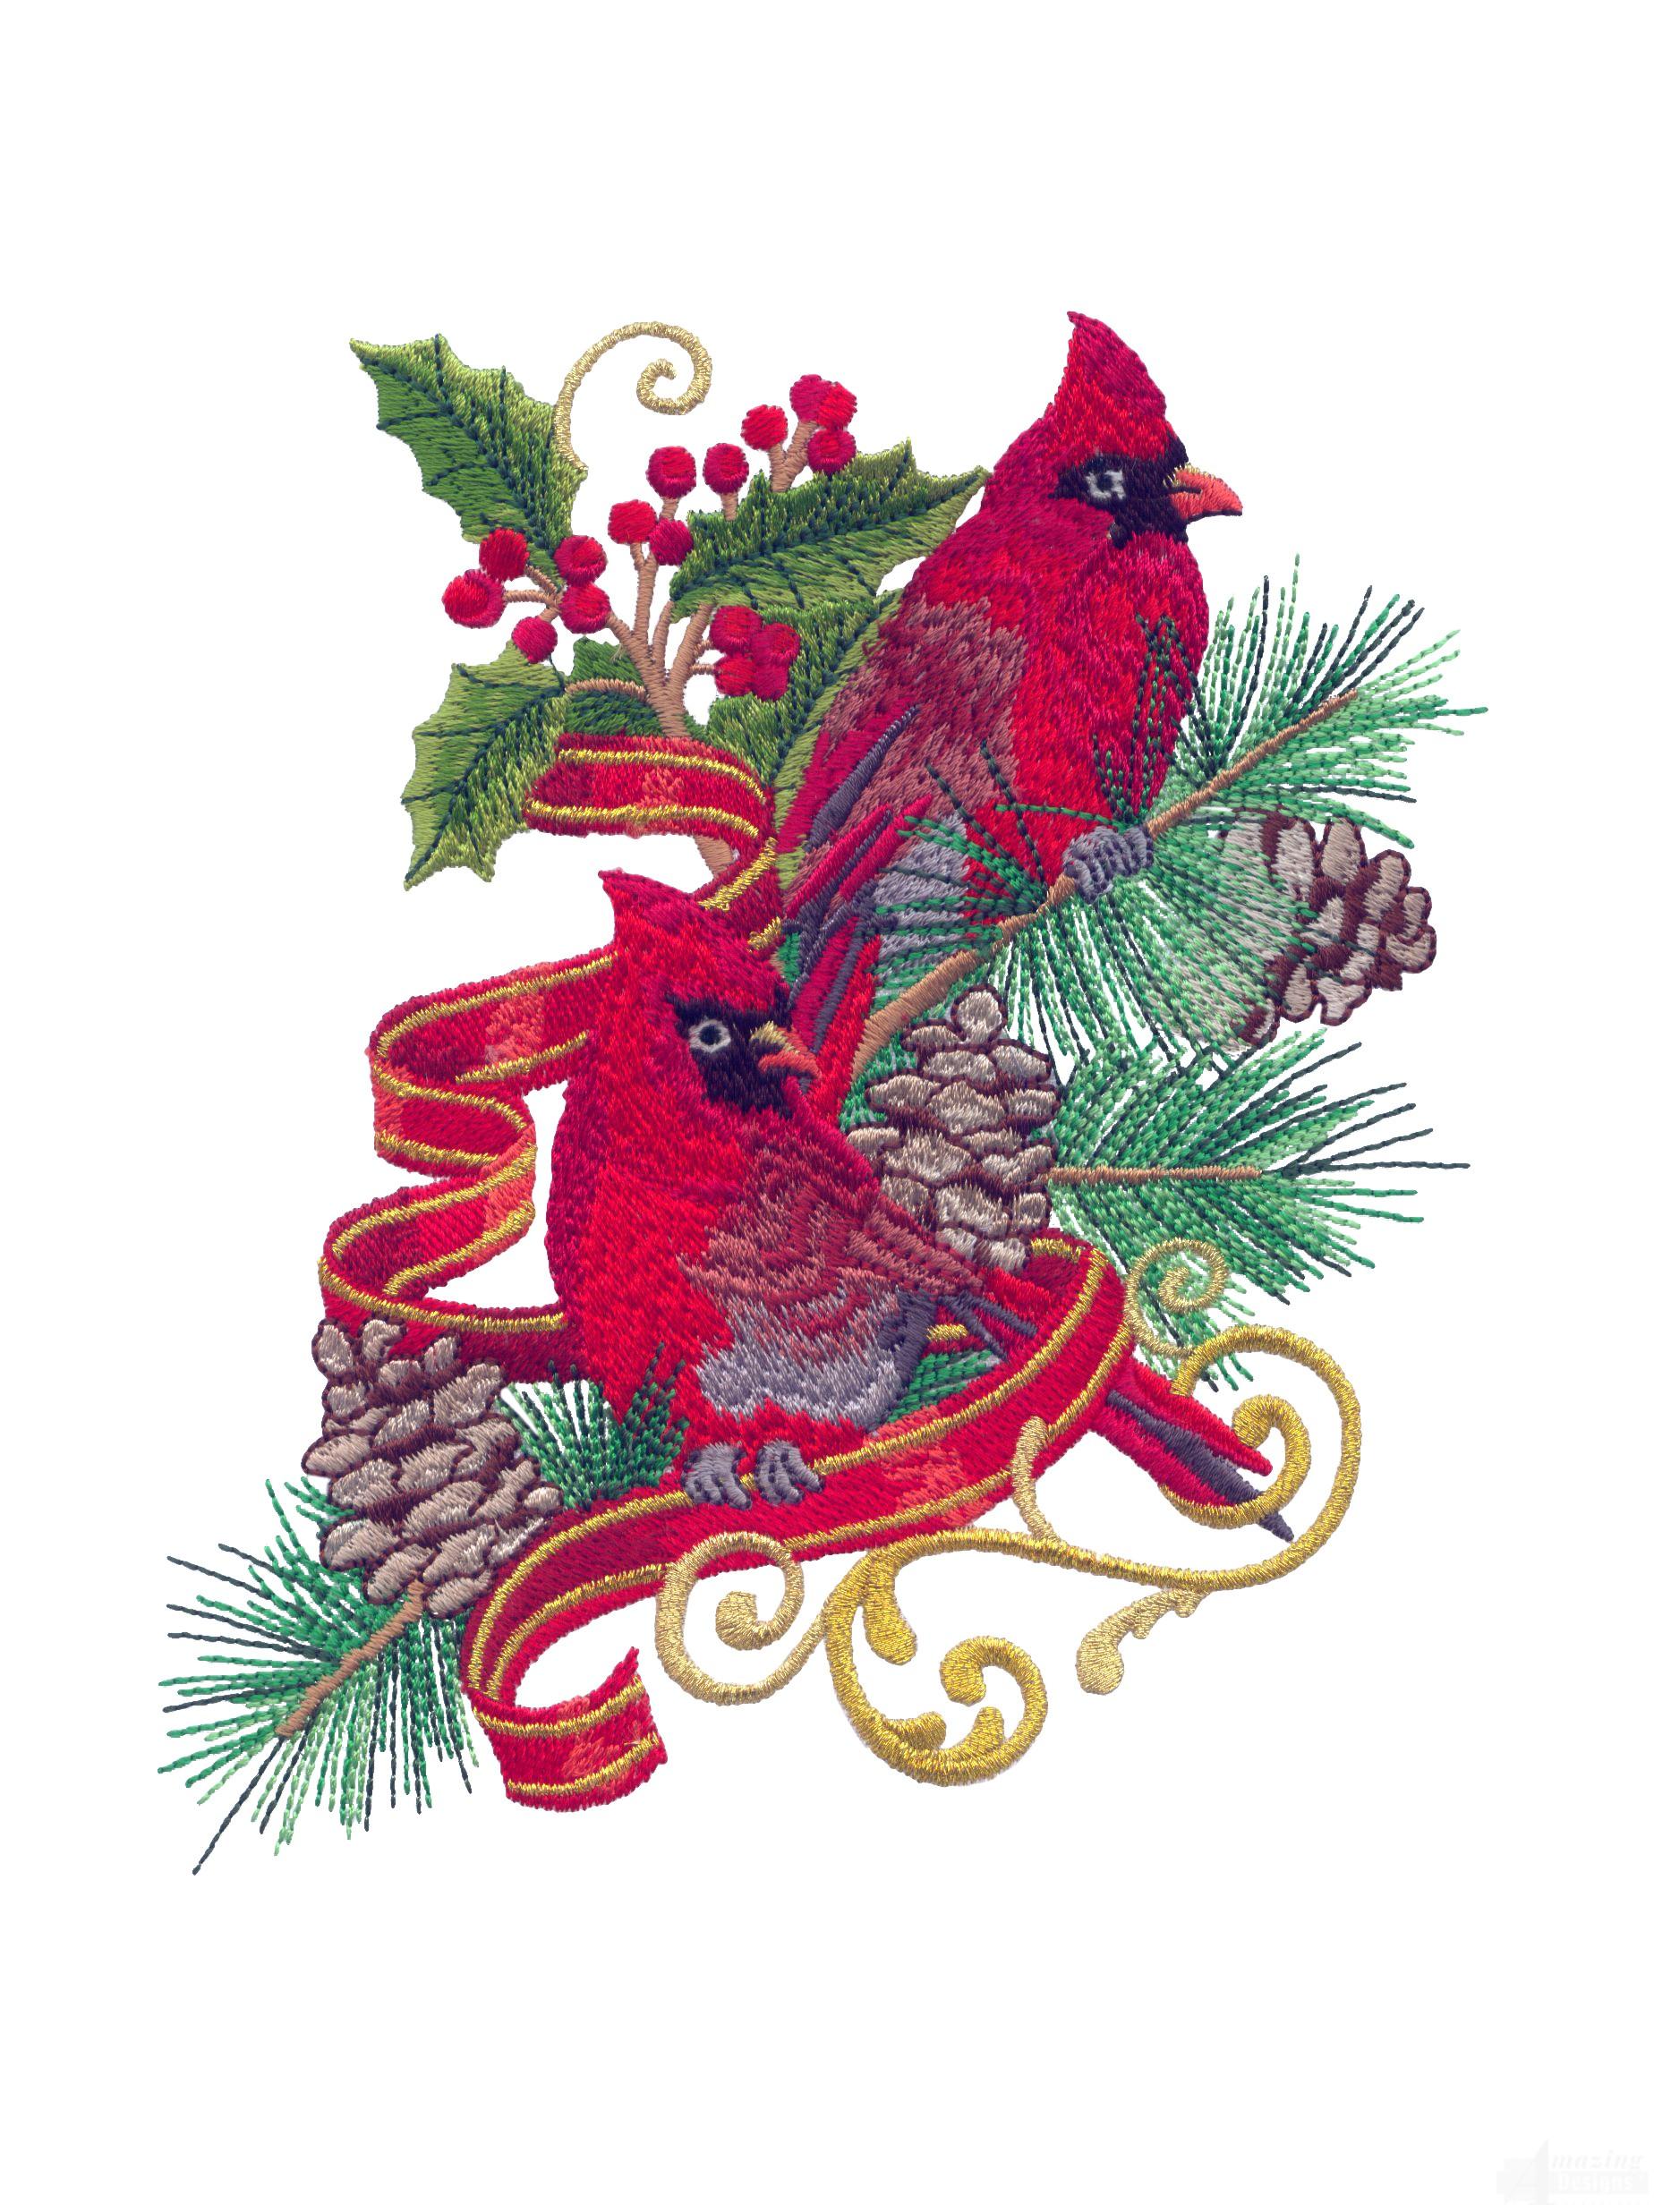 swnrcc108 regal cardinal embroidery design. Black Bedroom Furniture Sets. Home Design Ideas